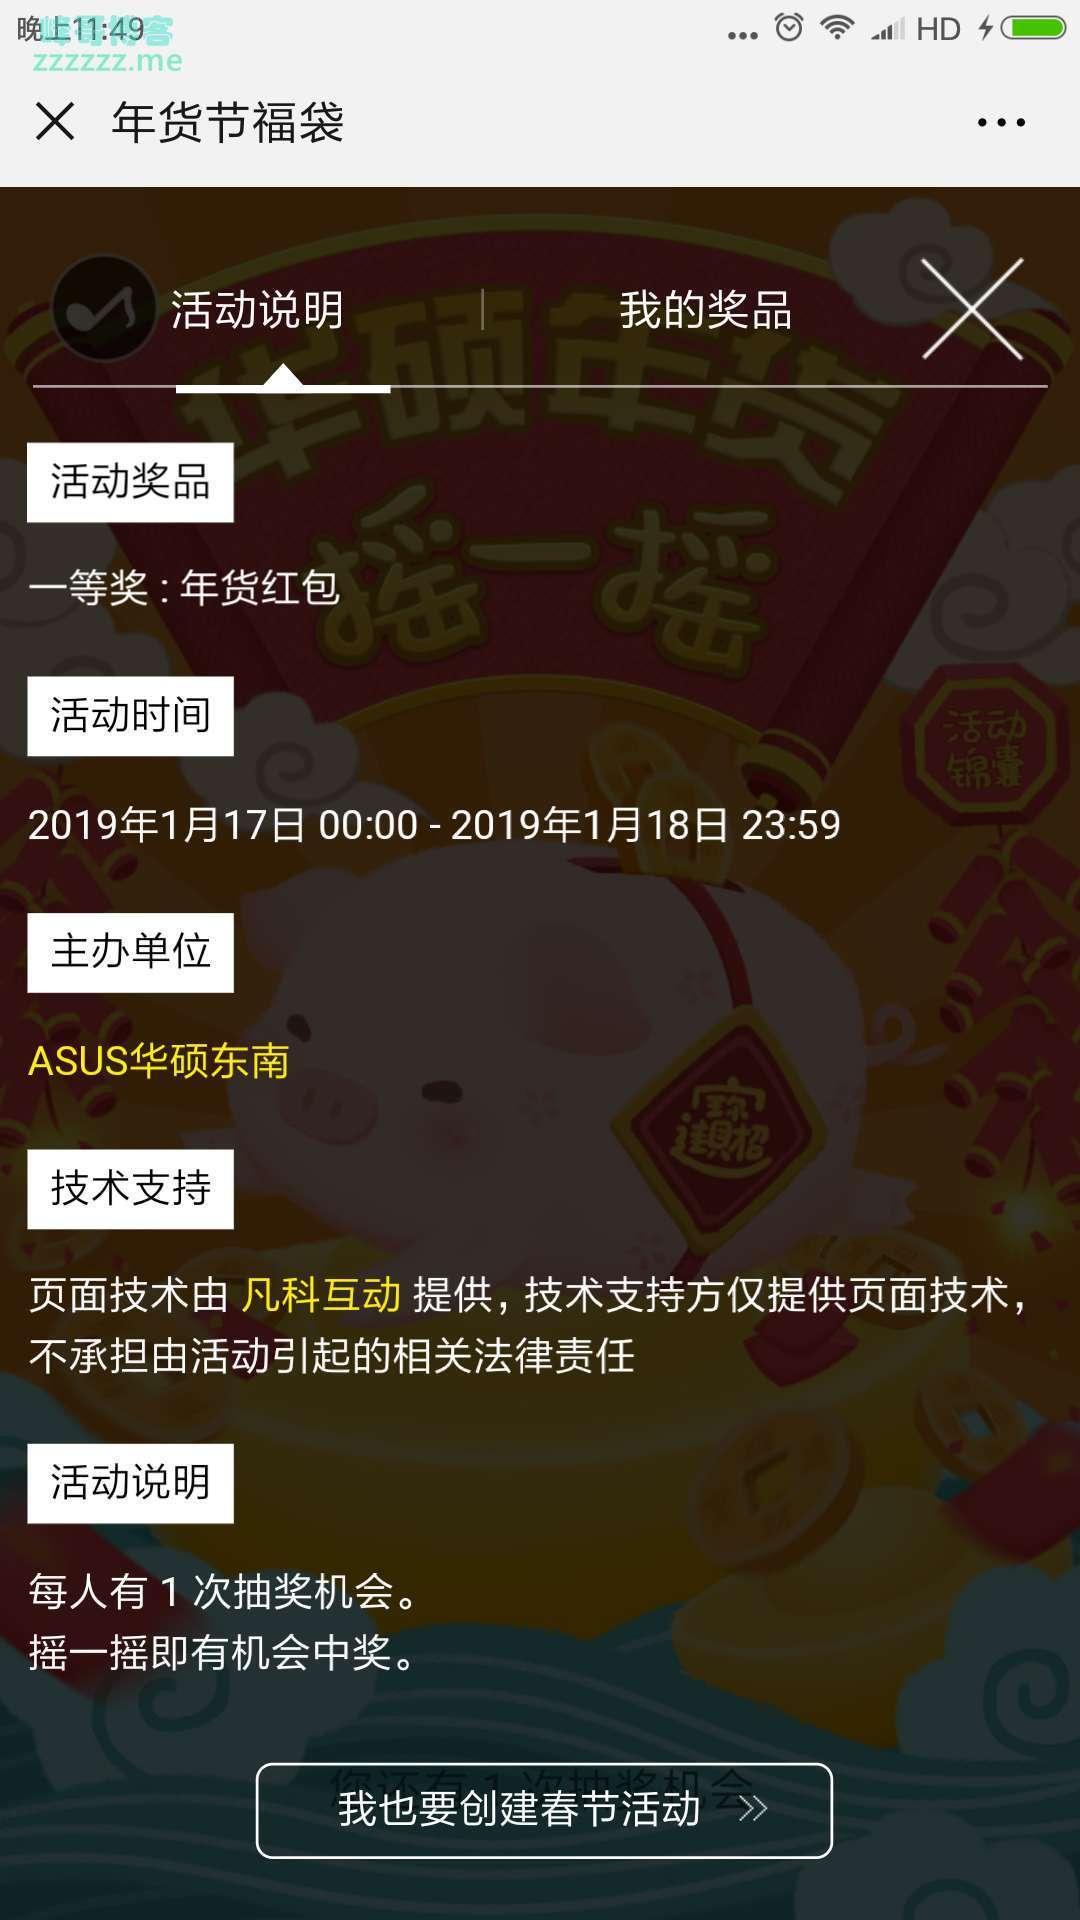 <ASUS华硕东南>年货节福袋(截止1月18日)